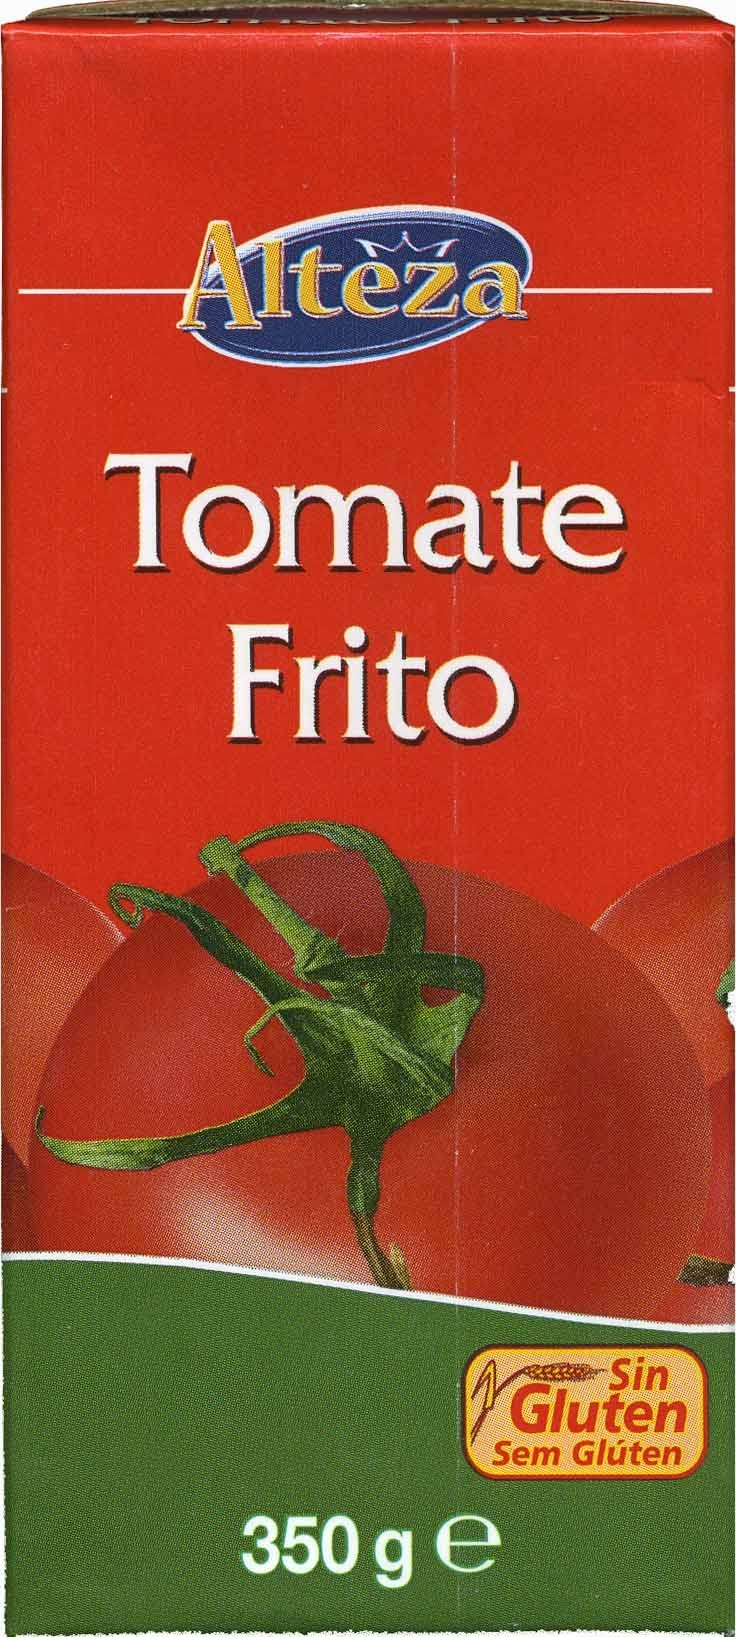 "Tomate frito ""Alteza"" - Produit - es"